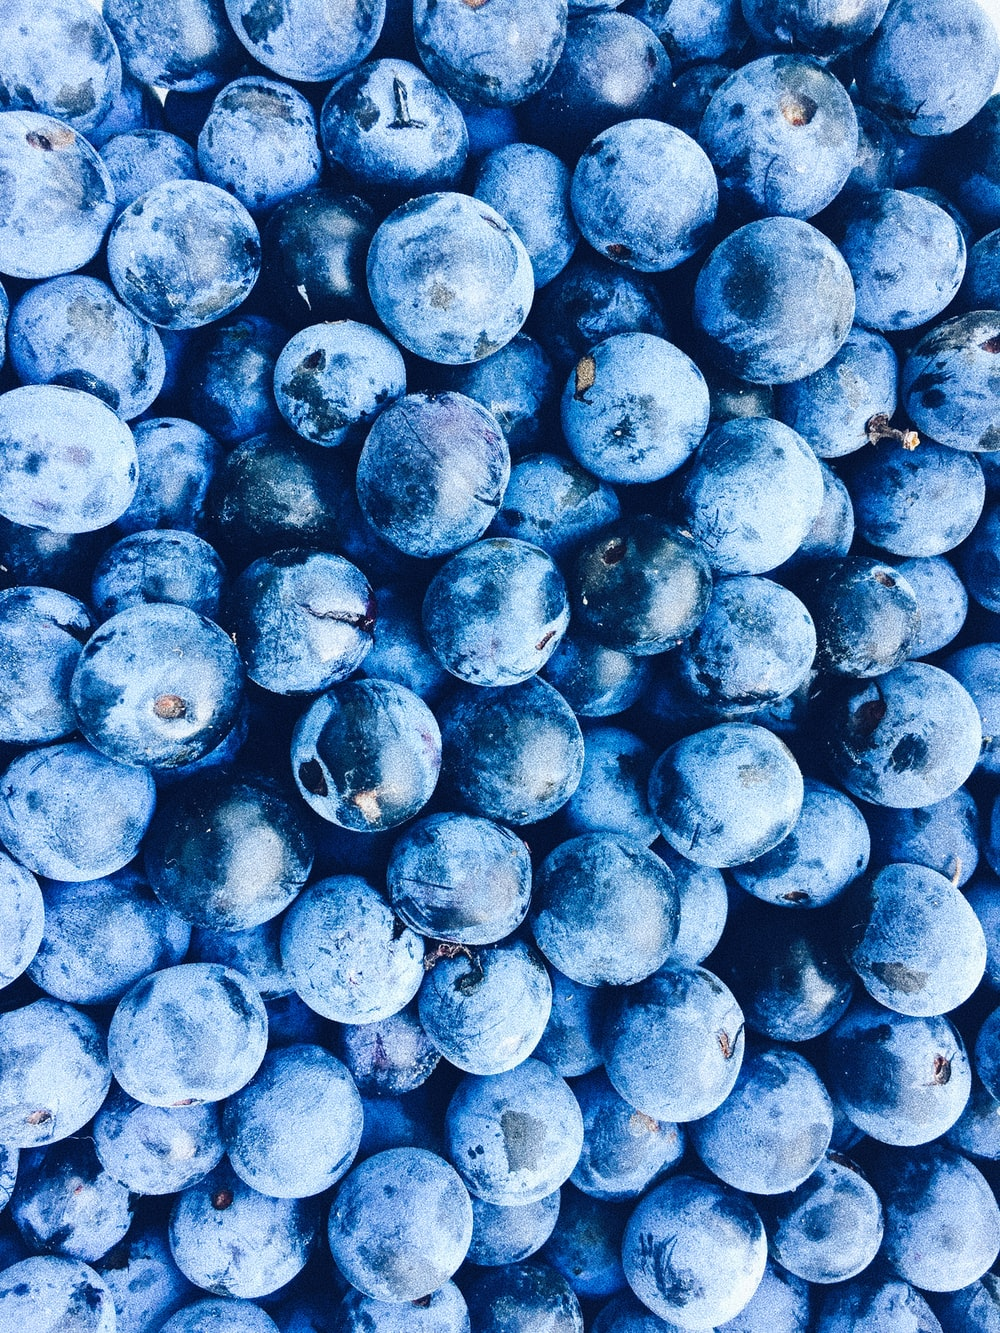 blue berry lot